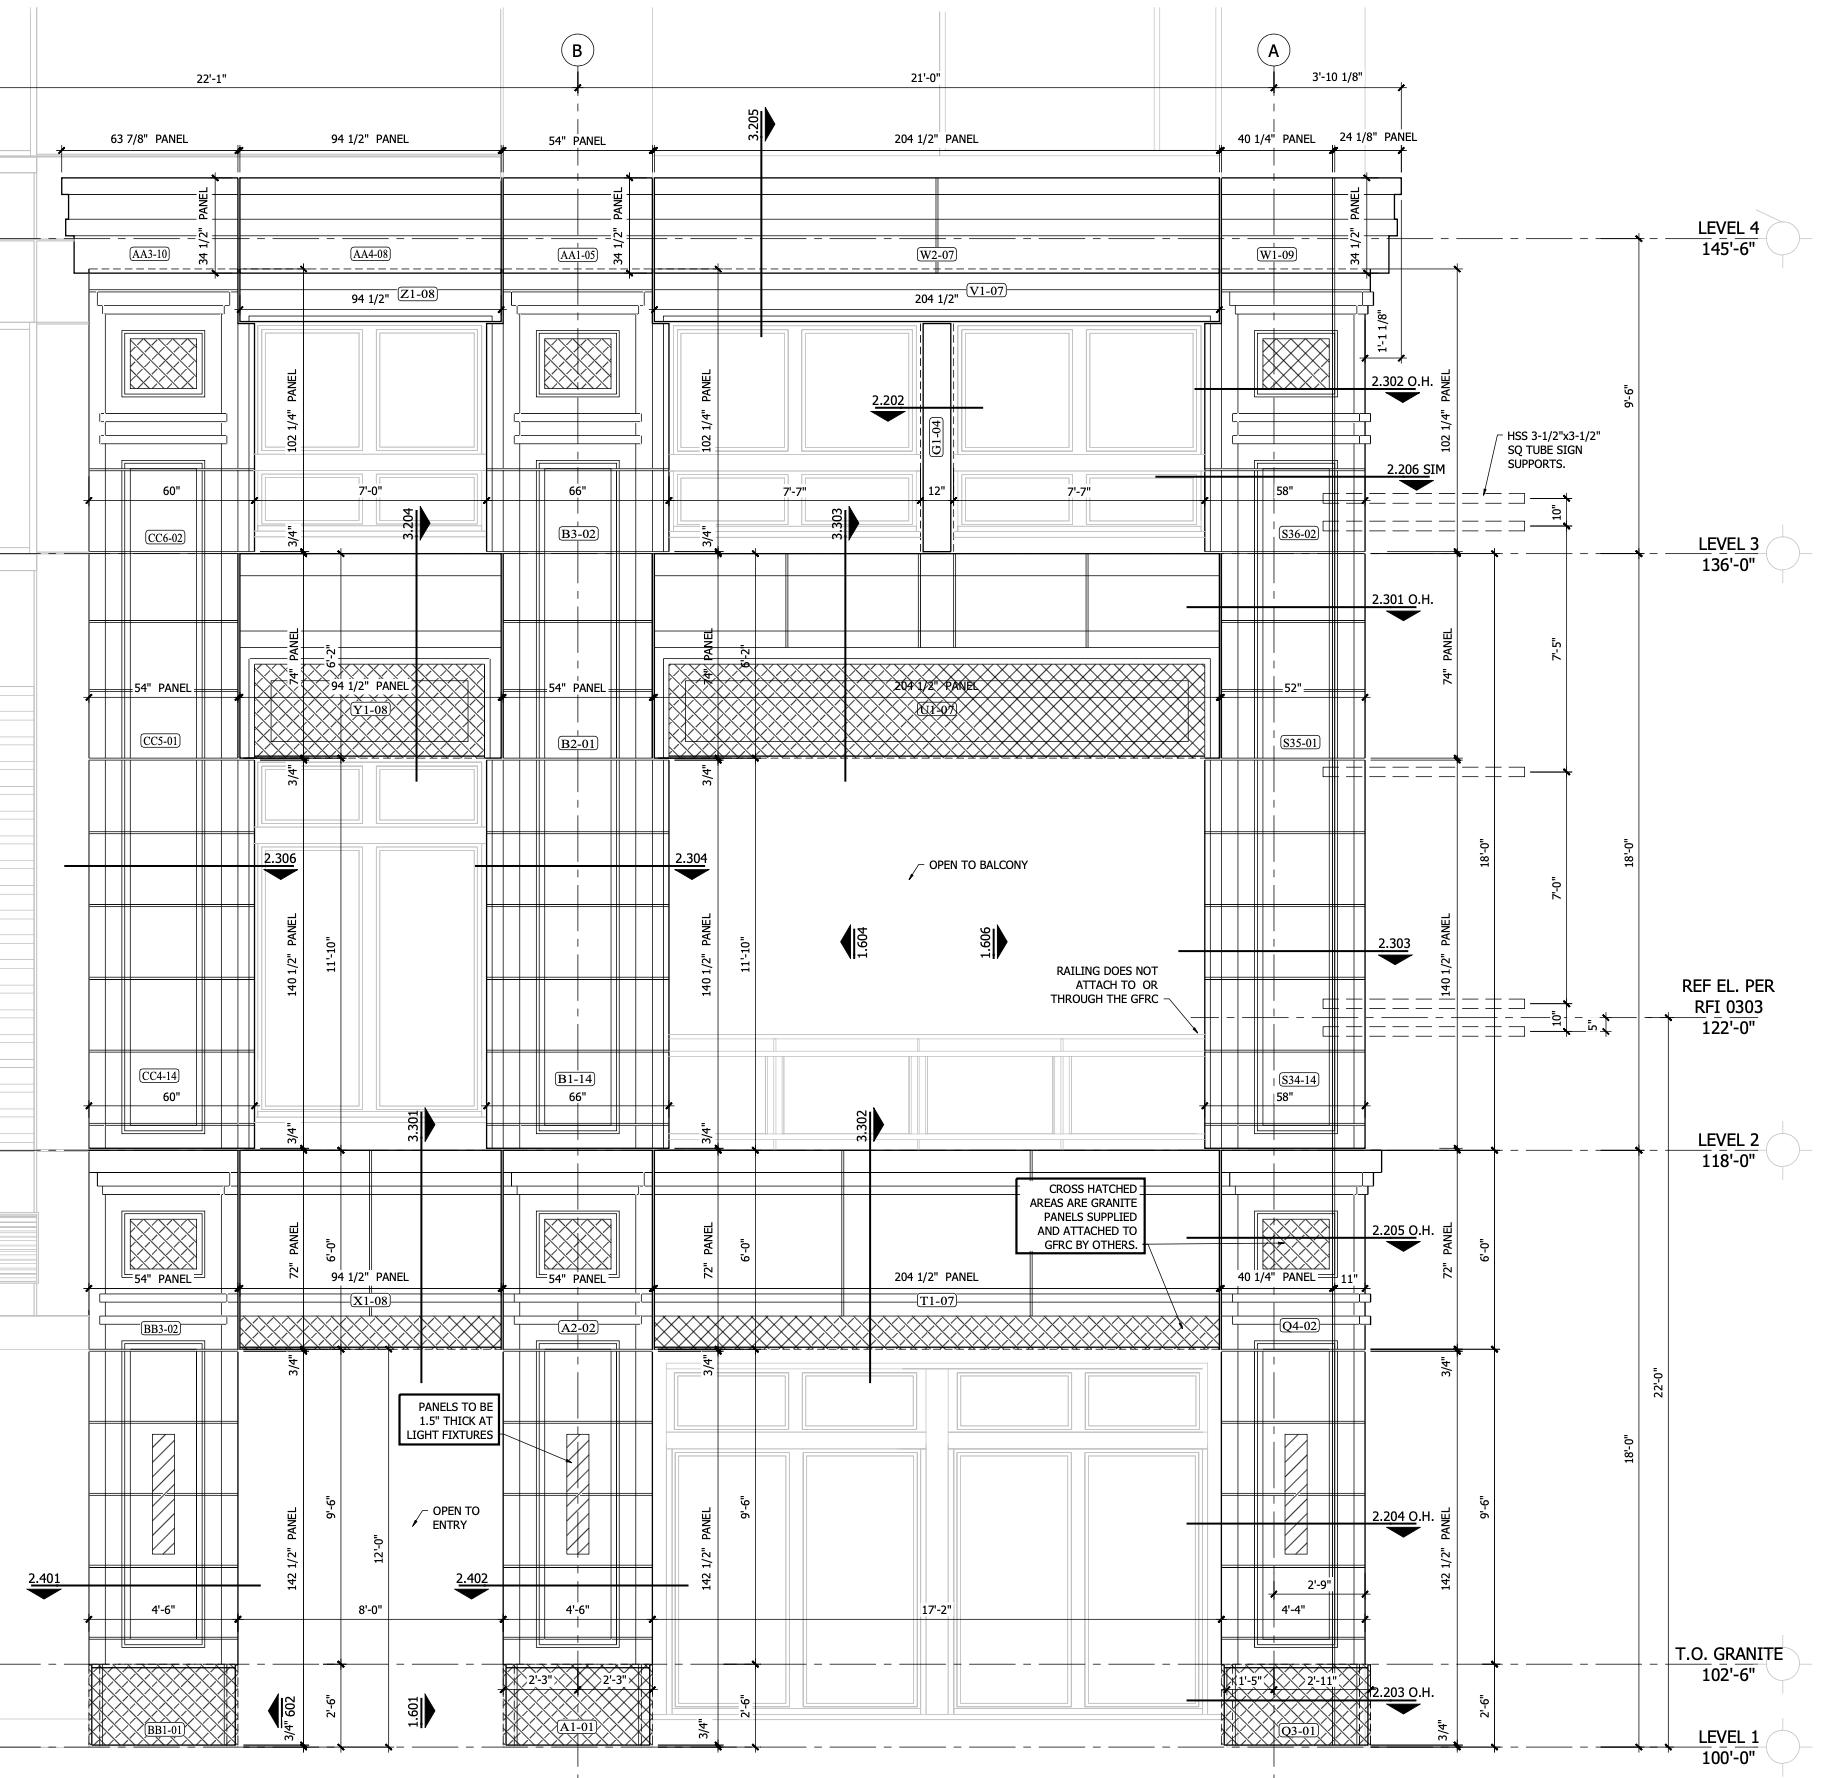 Marriott Hotel CAD Drawing - Settings Plan - East Side Elevation